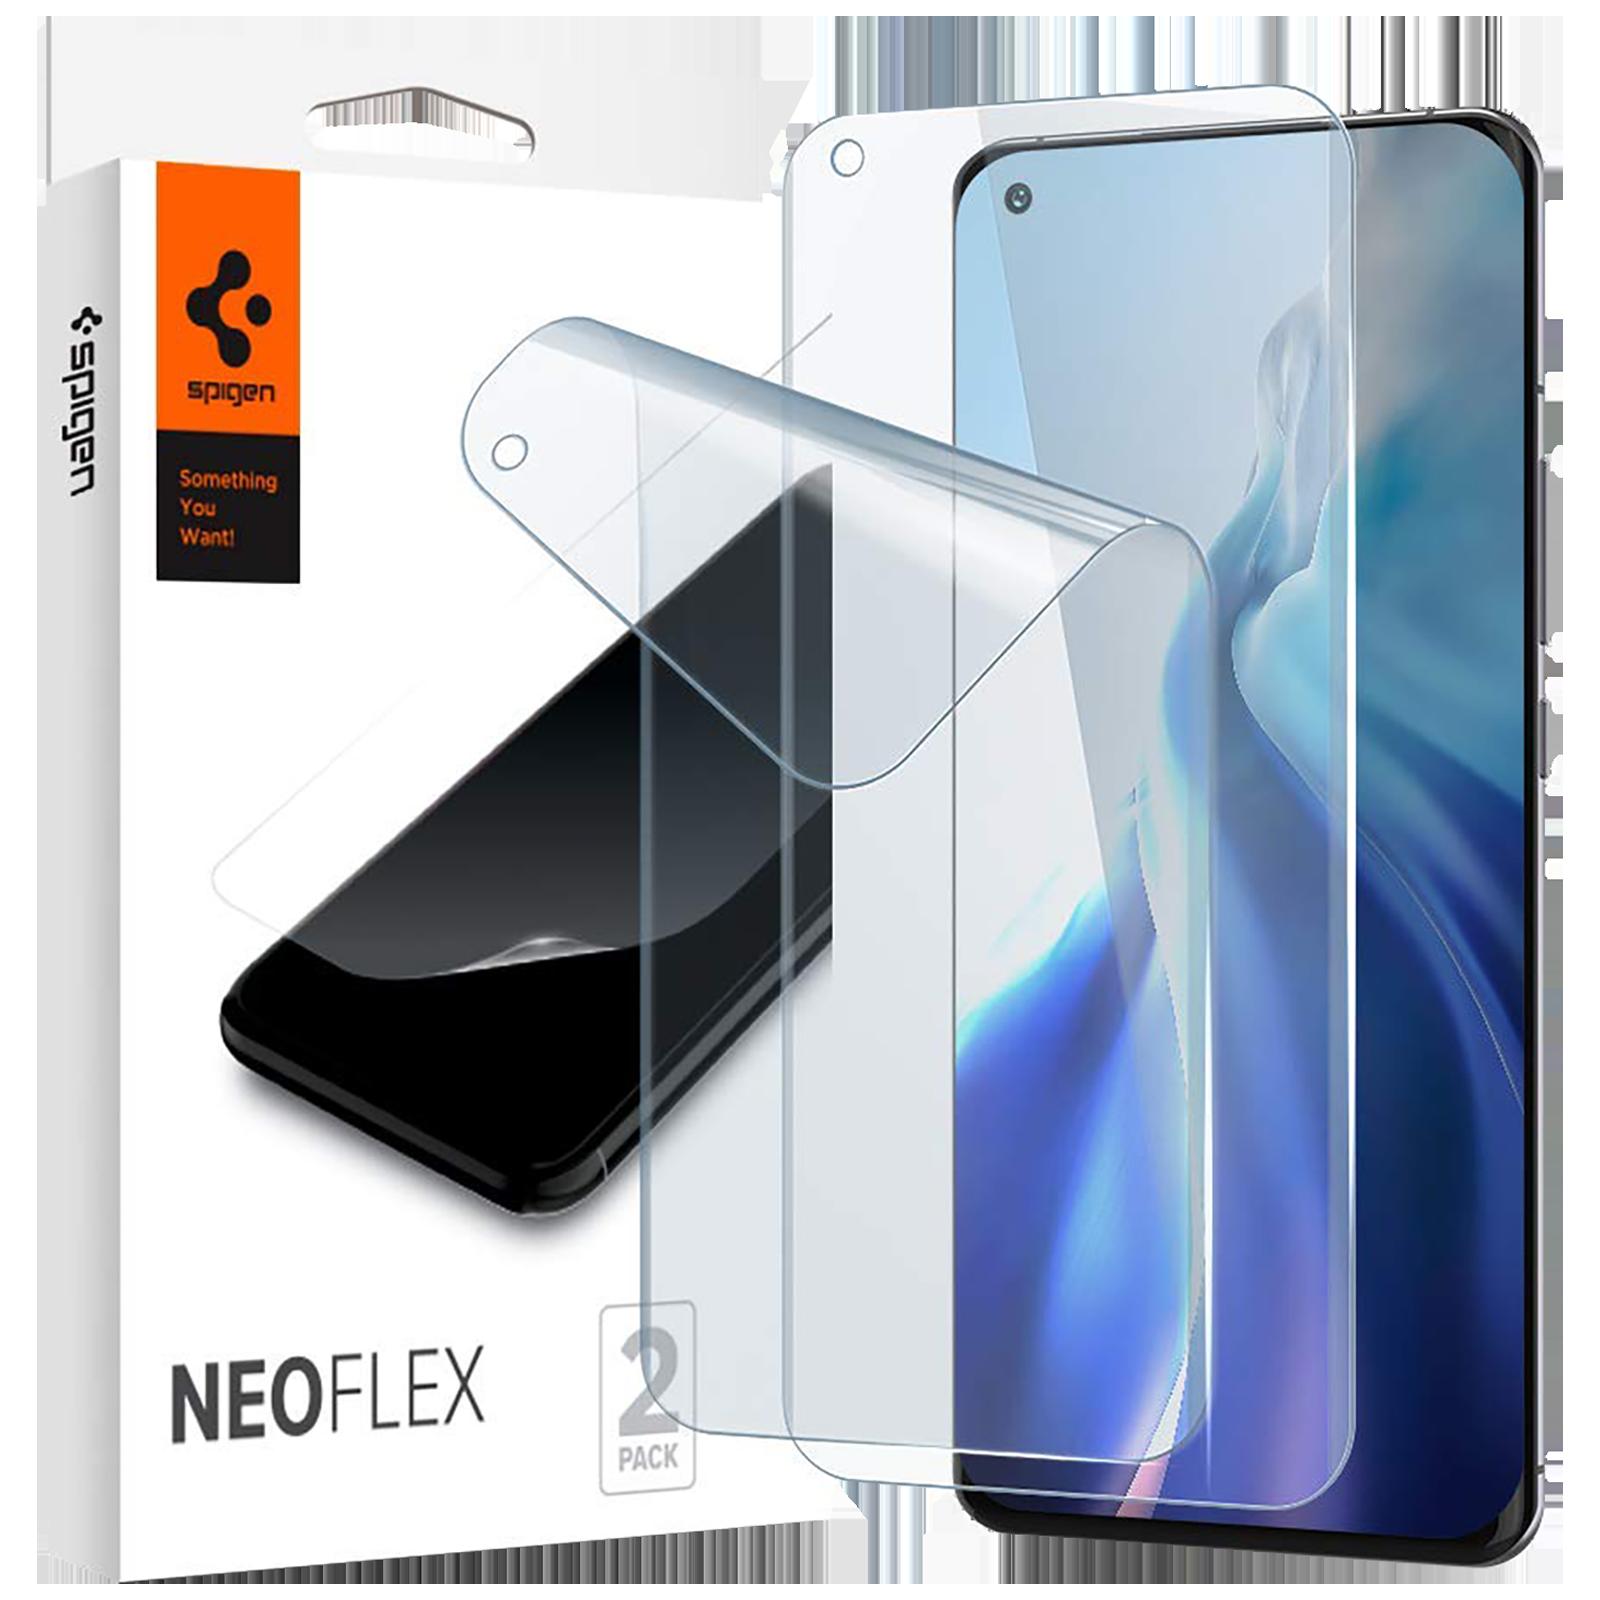 Spigen NeoFlex Screen Protector For Mi 11/Mi 11 Pro/Mi 11 Ultra (Scratch Resistant, AFL02837, Transparent)_1